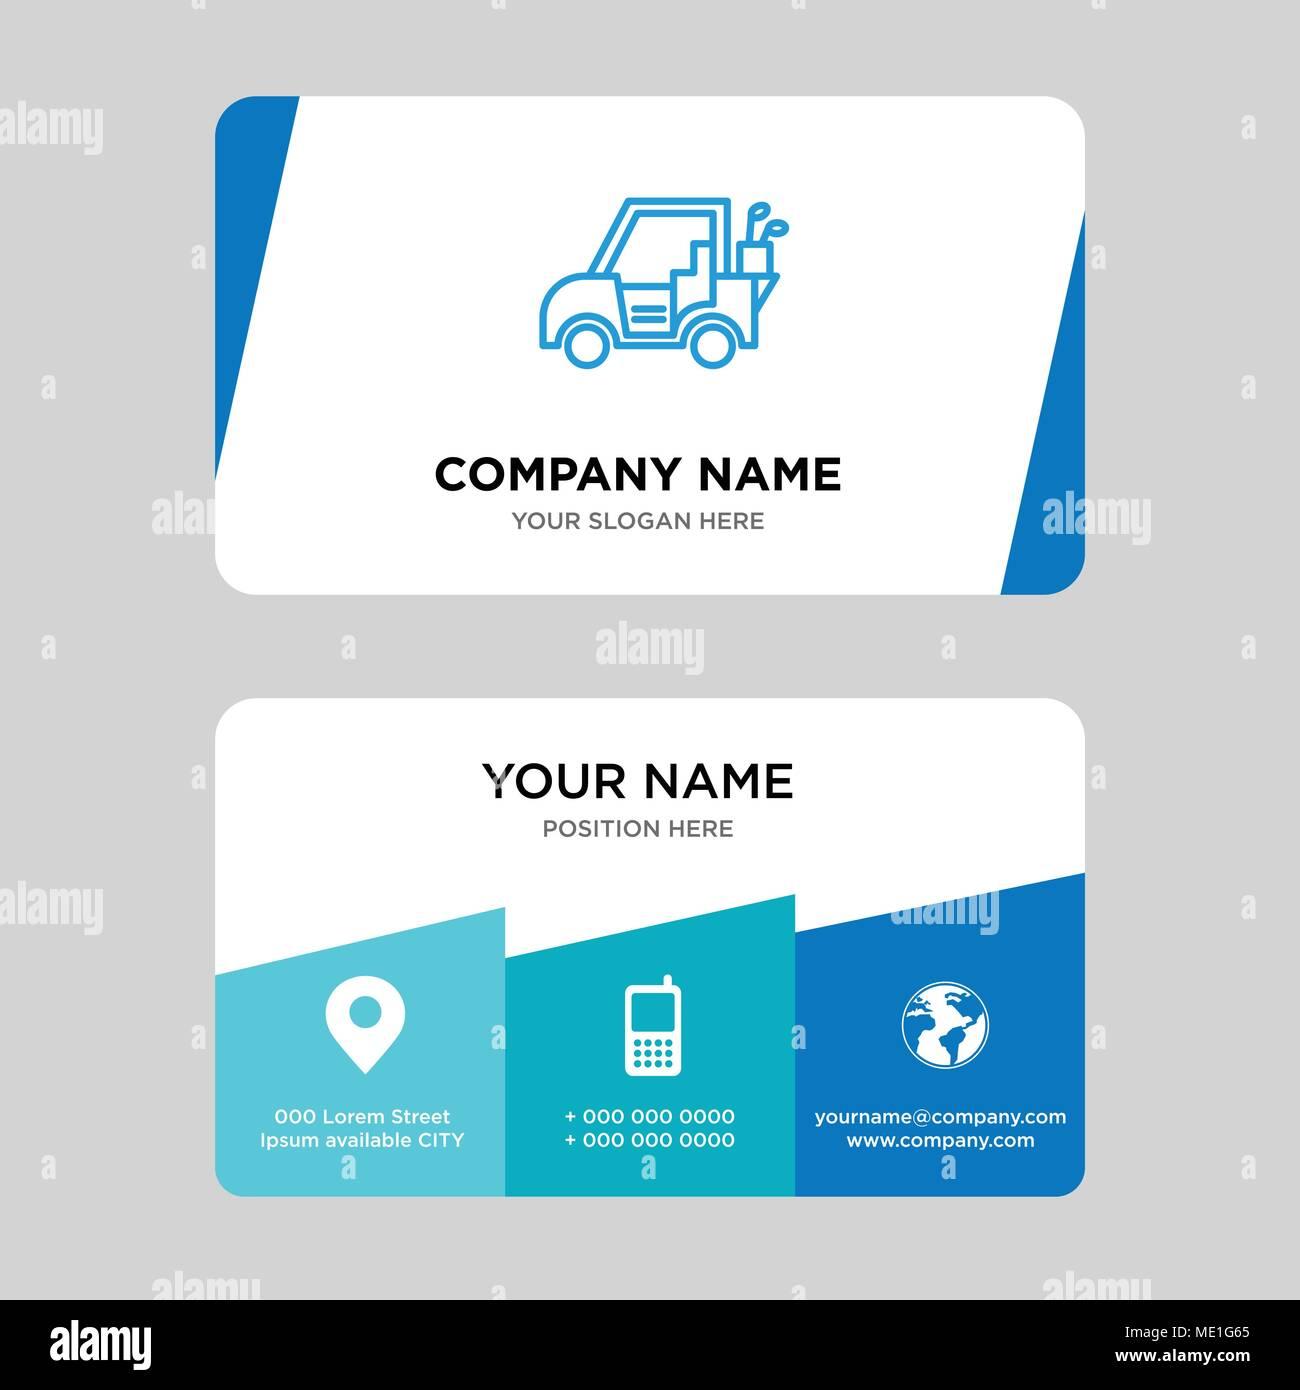 Golf car business card design template visiting for your company golf car business card design template visiting for your company modern creative and clean identity card vector illustration colourmoves